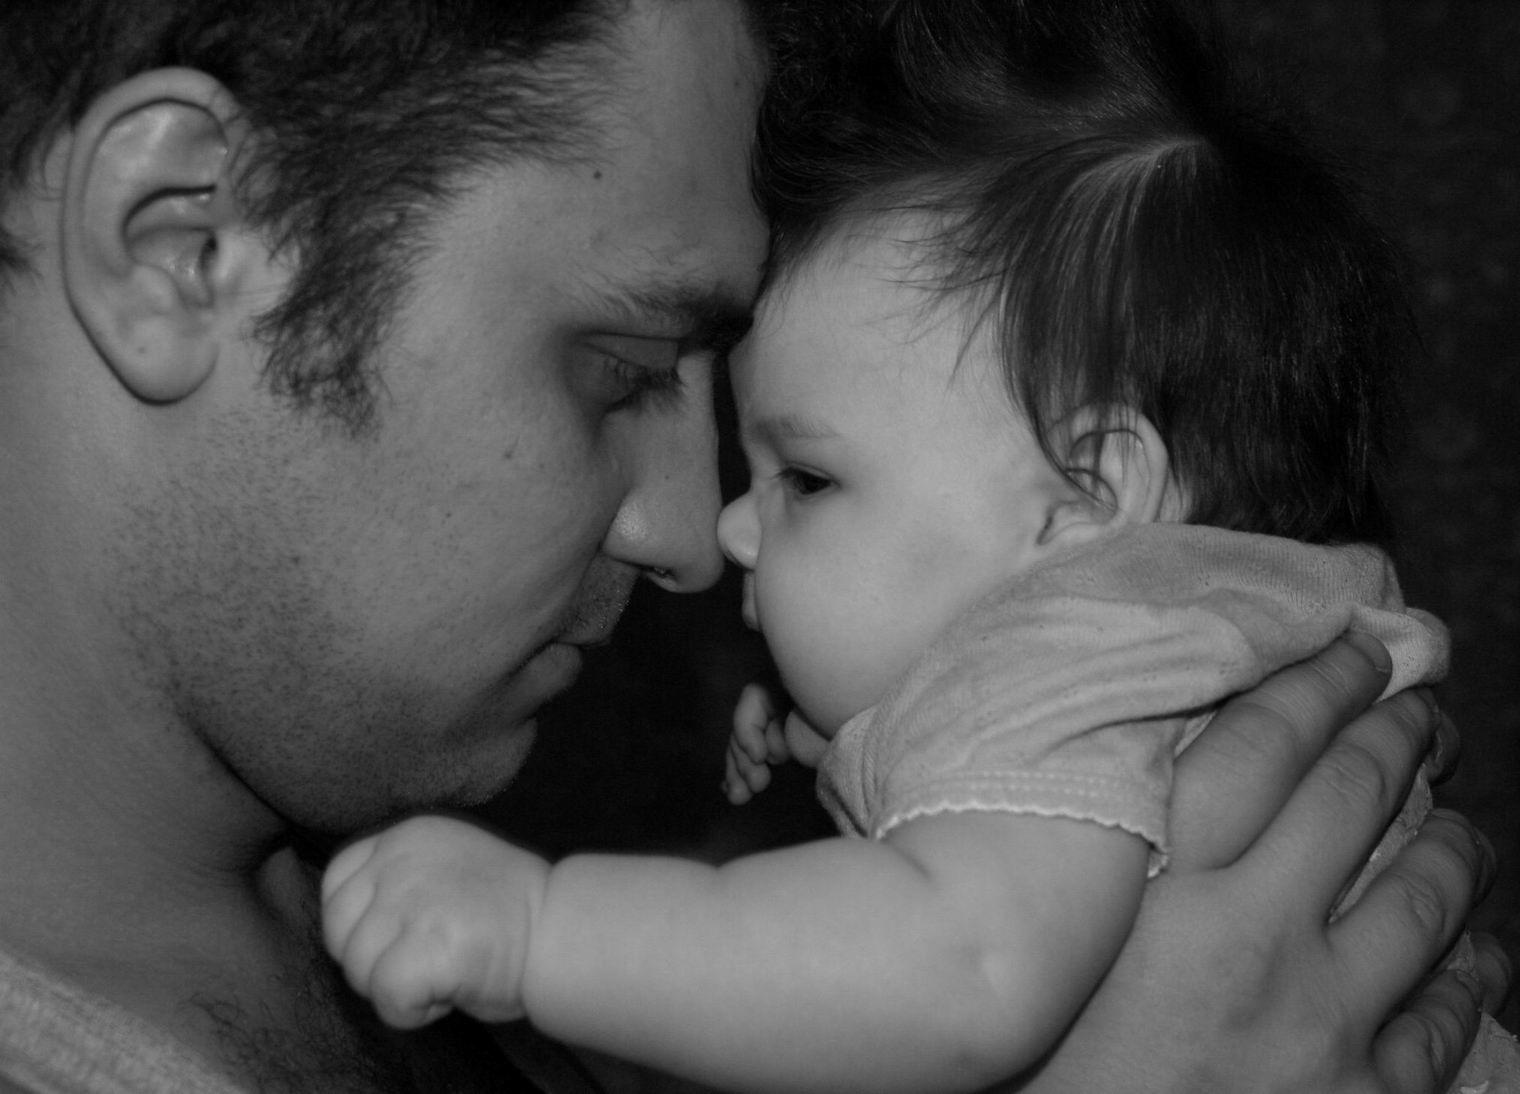 Эротика девочка и отец 7 фотография